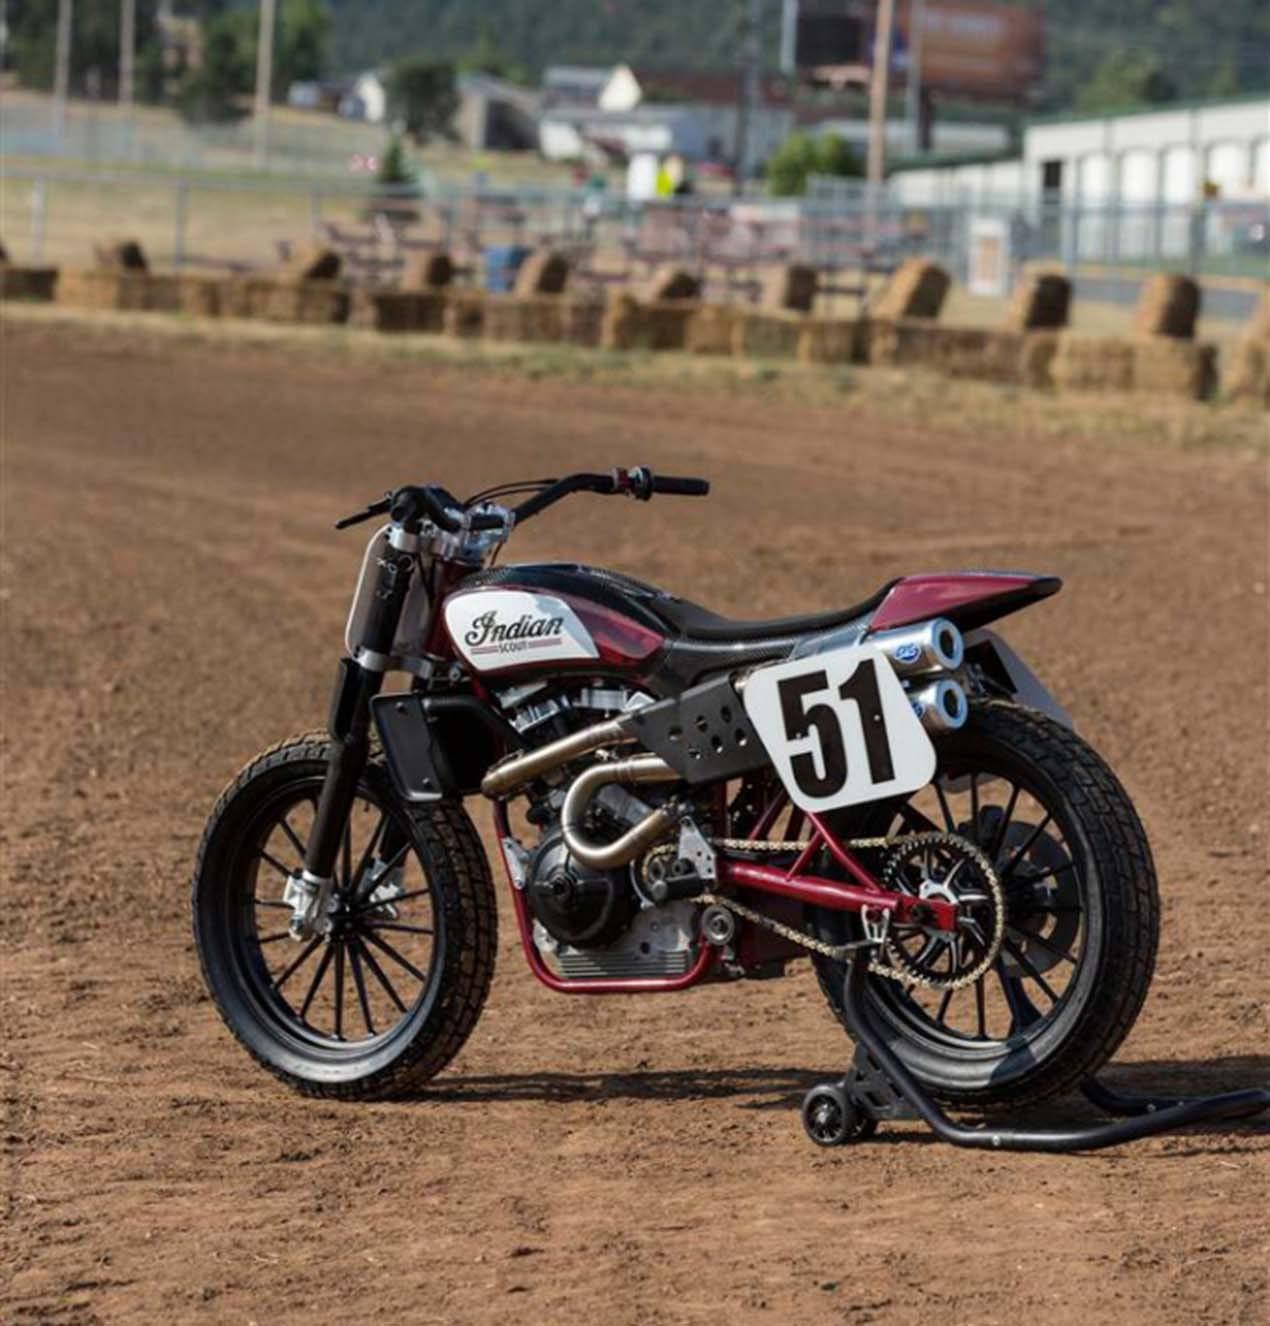 Indian-Scout-FTR750-flat-track-race-bike-07